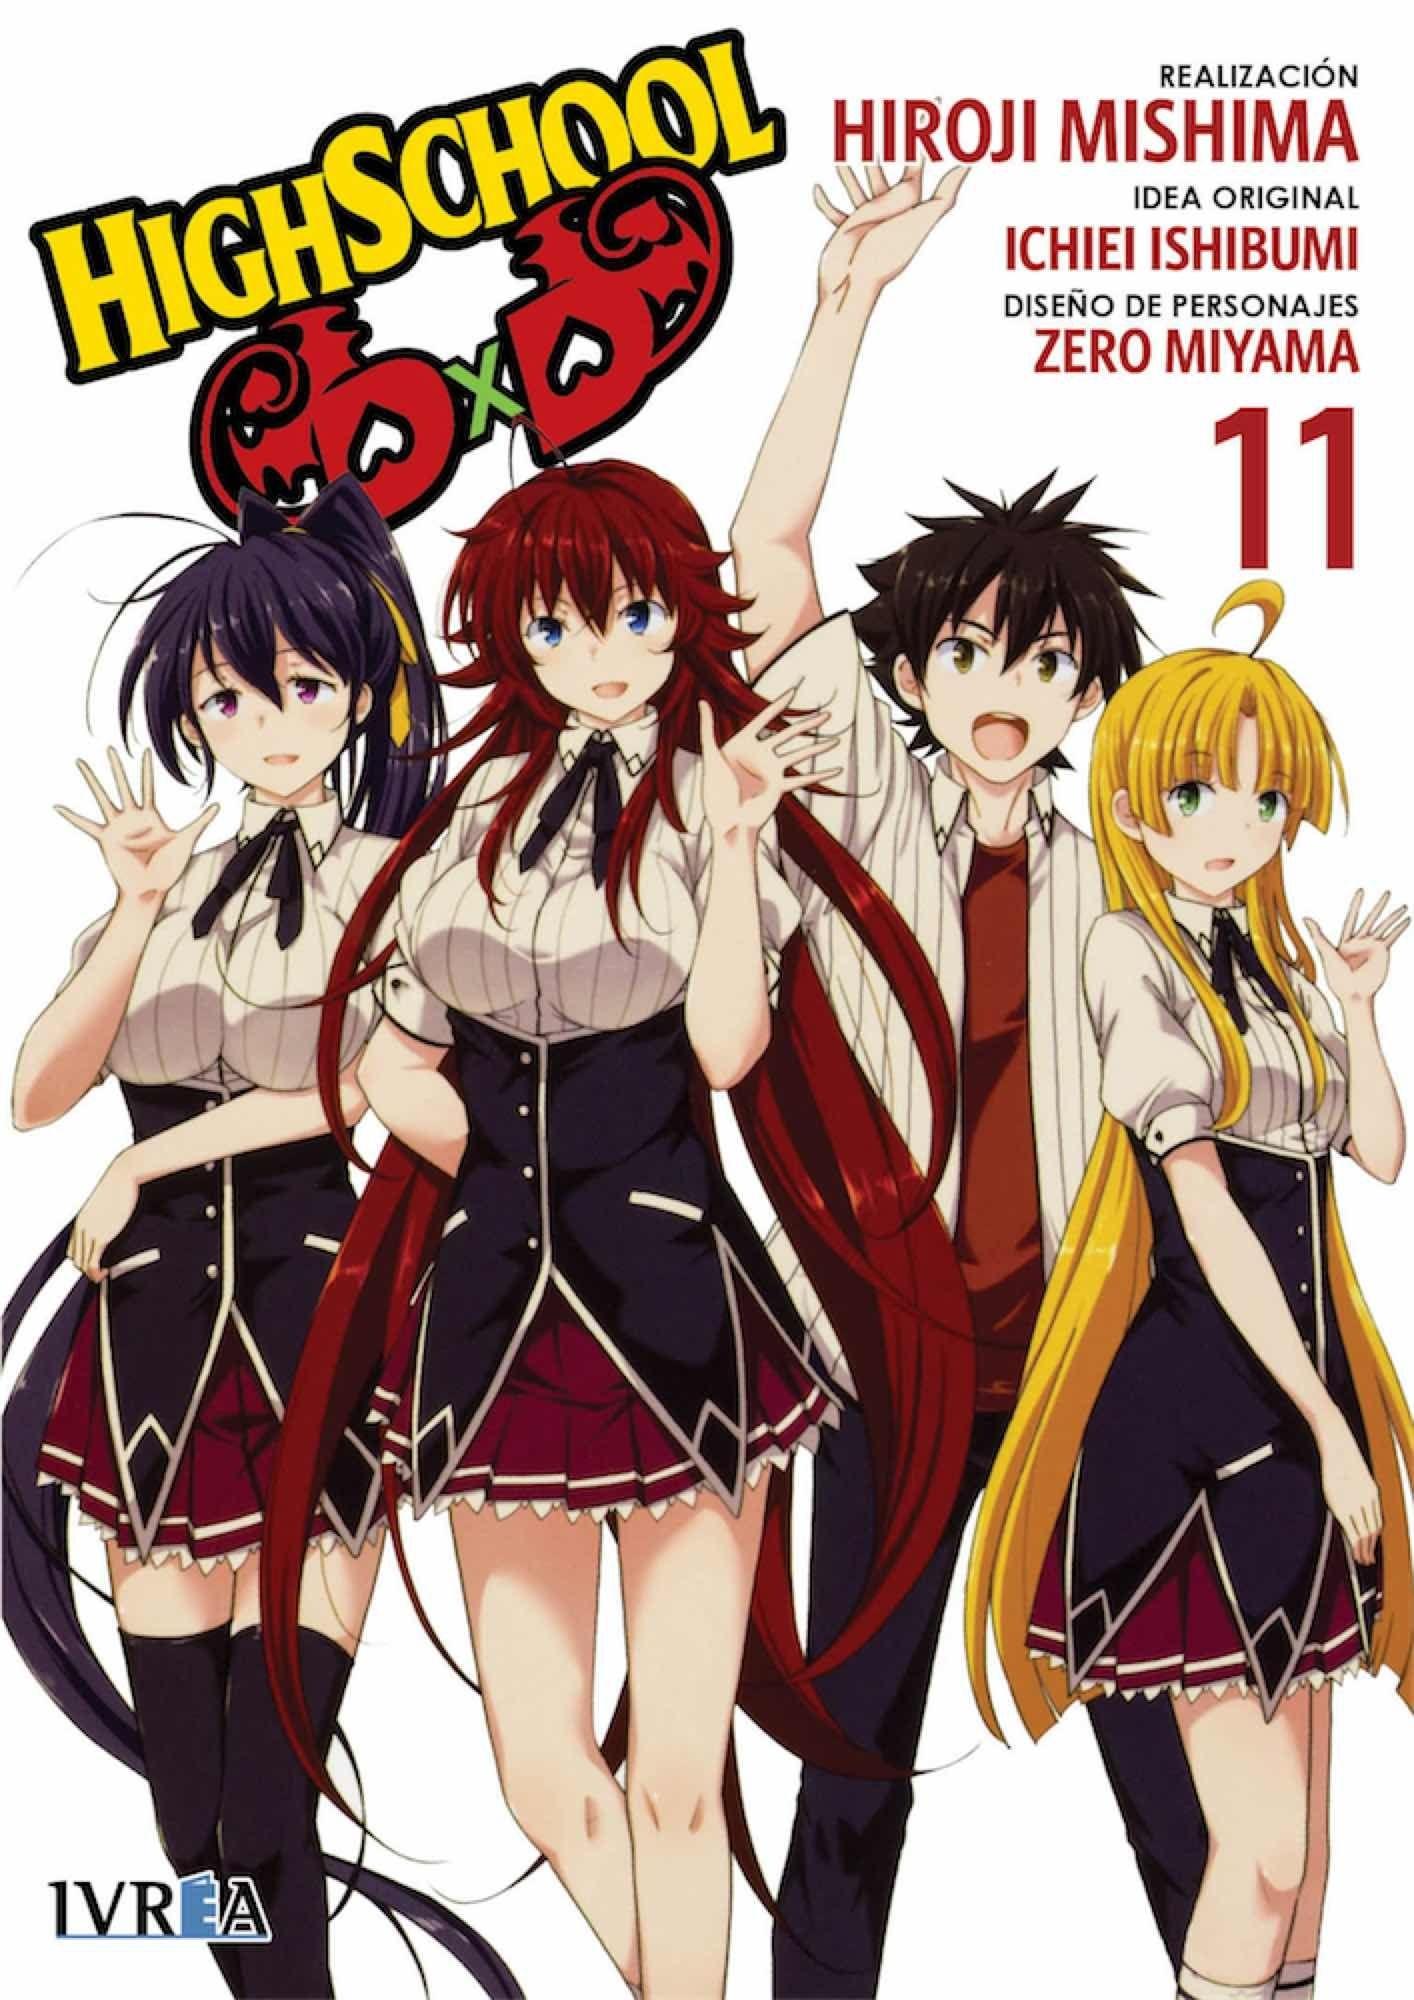 Highschool Dxd Manga 11 Isbn 9788417537302 Manga De Hirohi Mishima